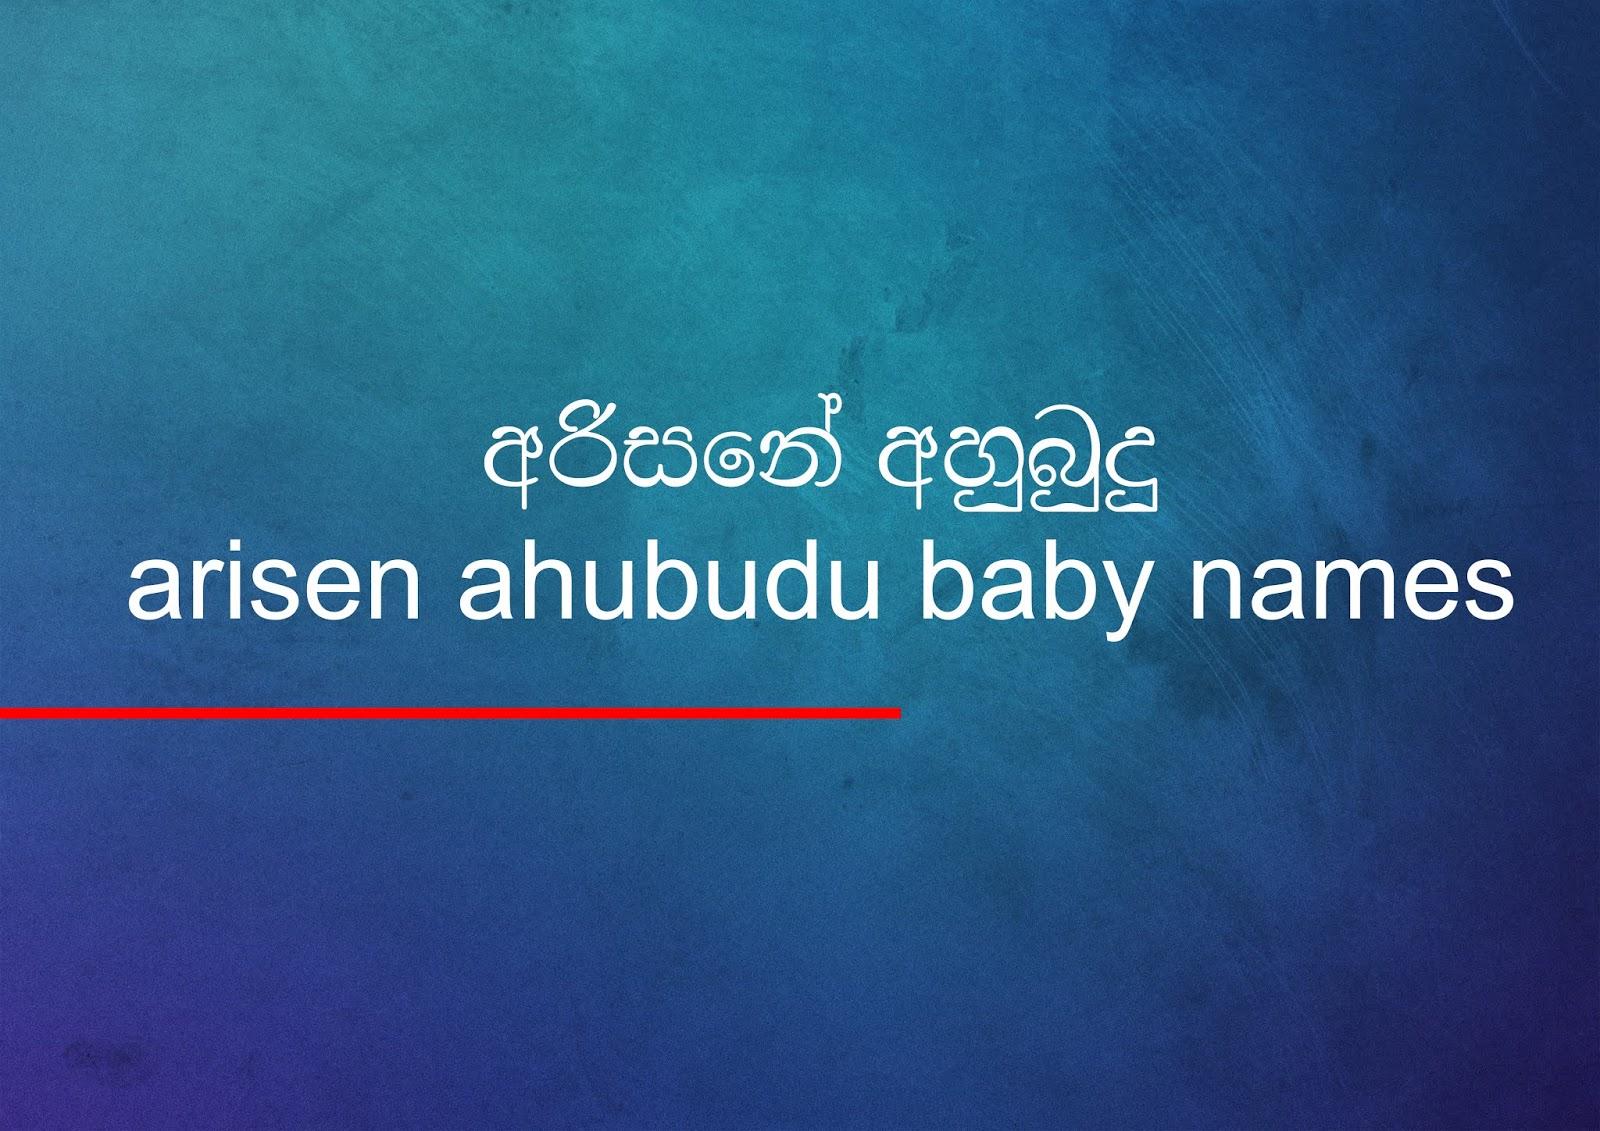 Arisen Ahubudu Baby Names Arisen Ahubudu Baby Names